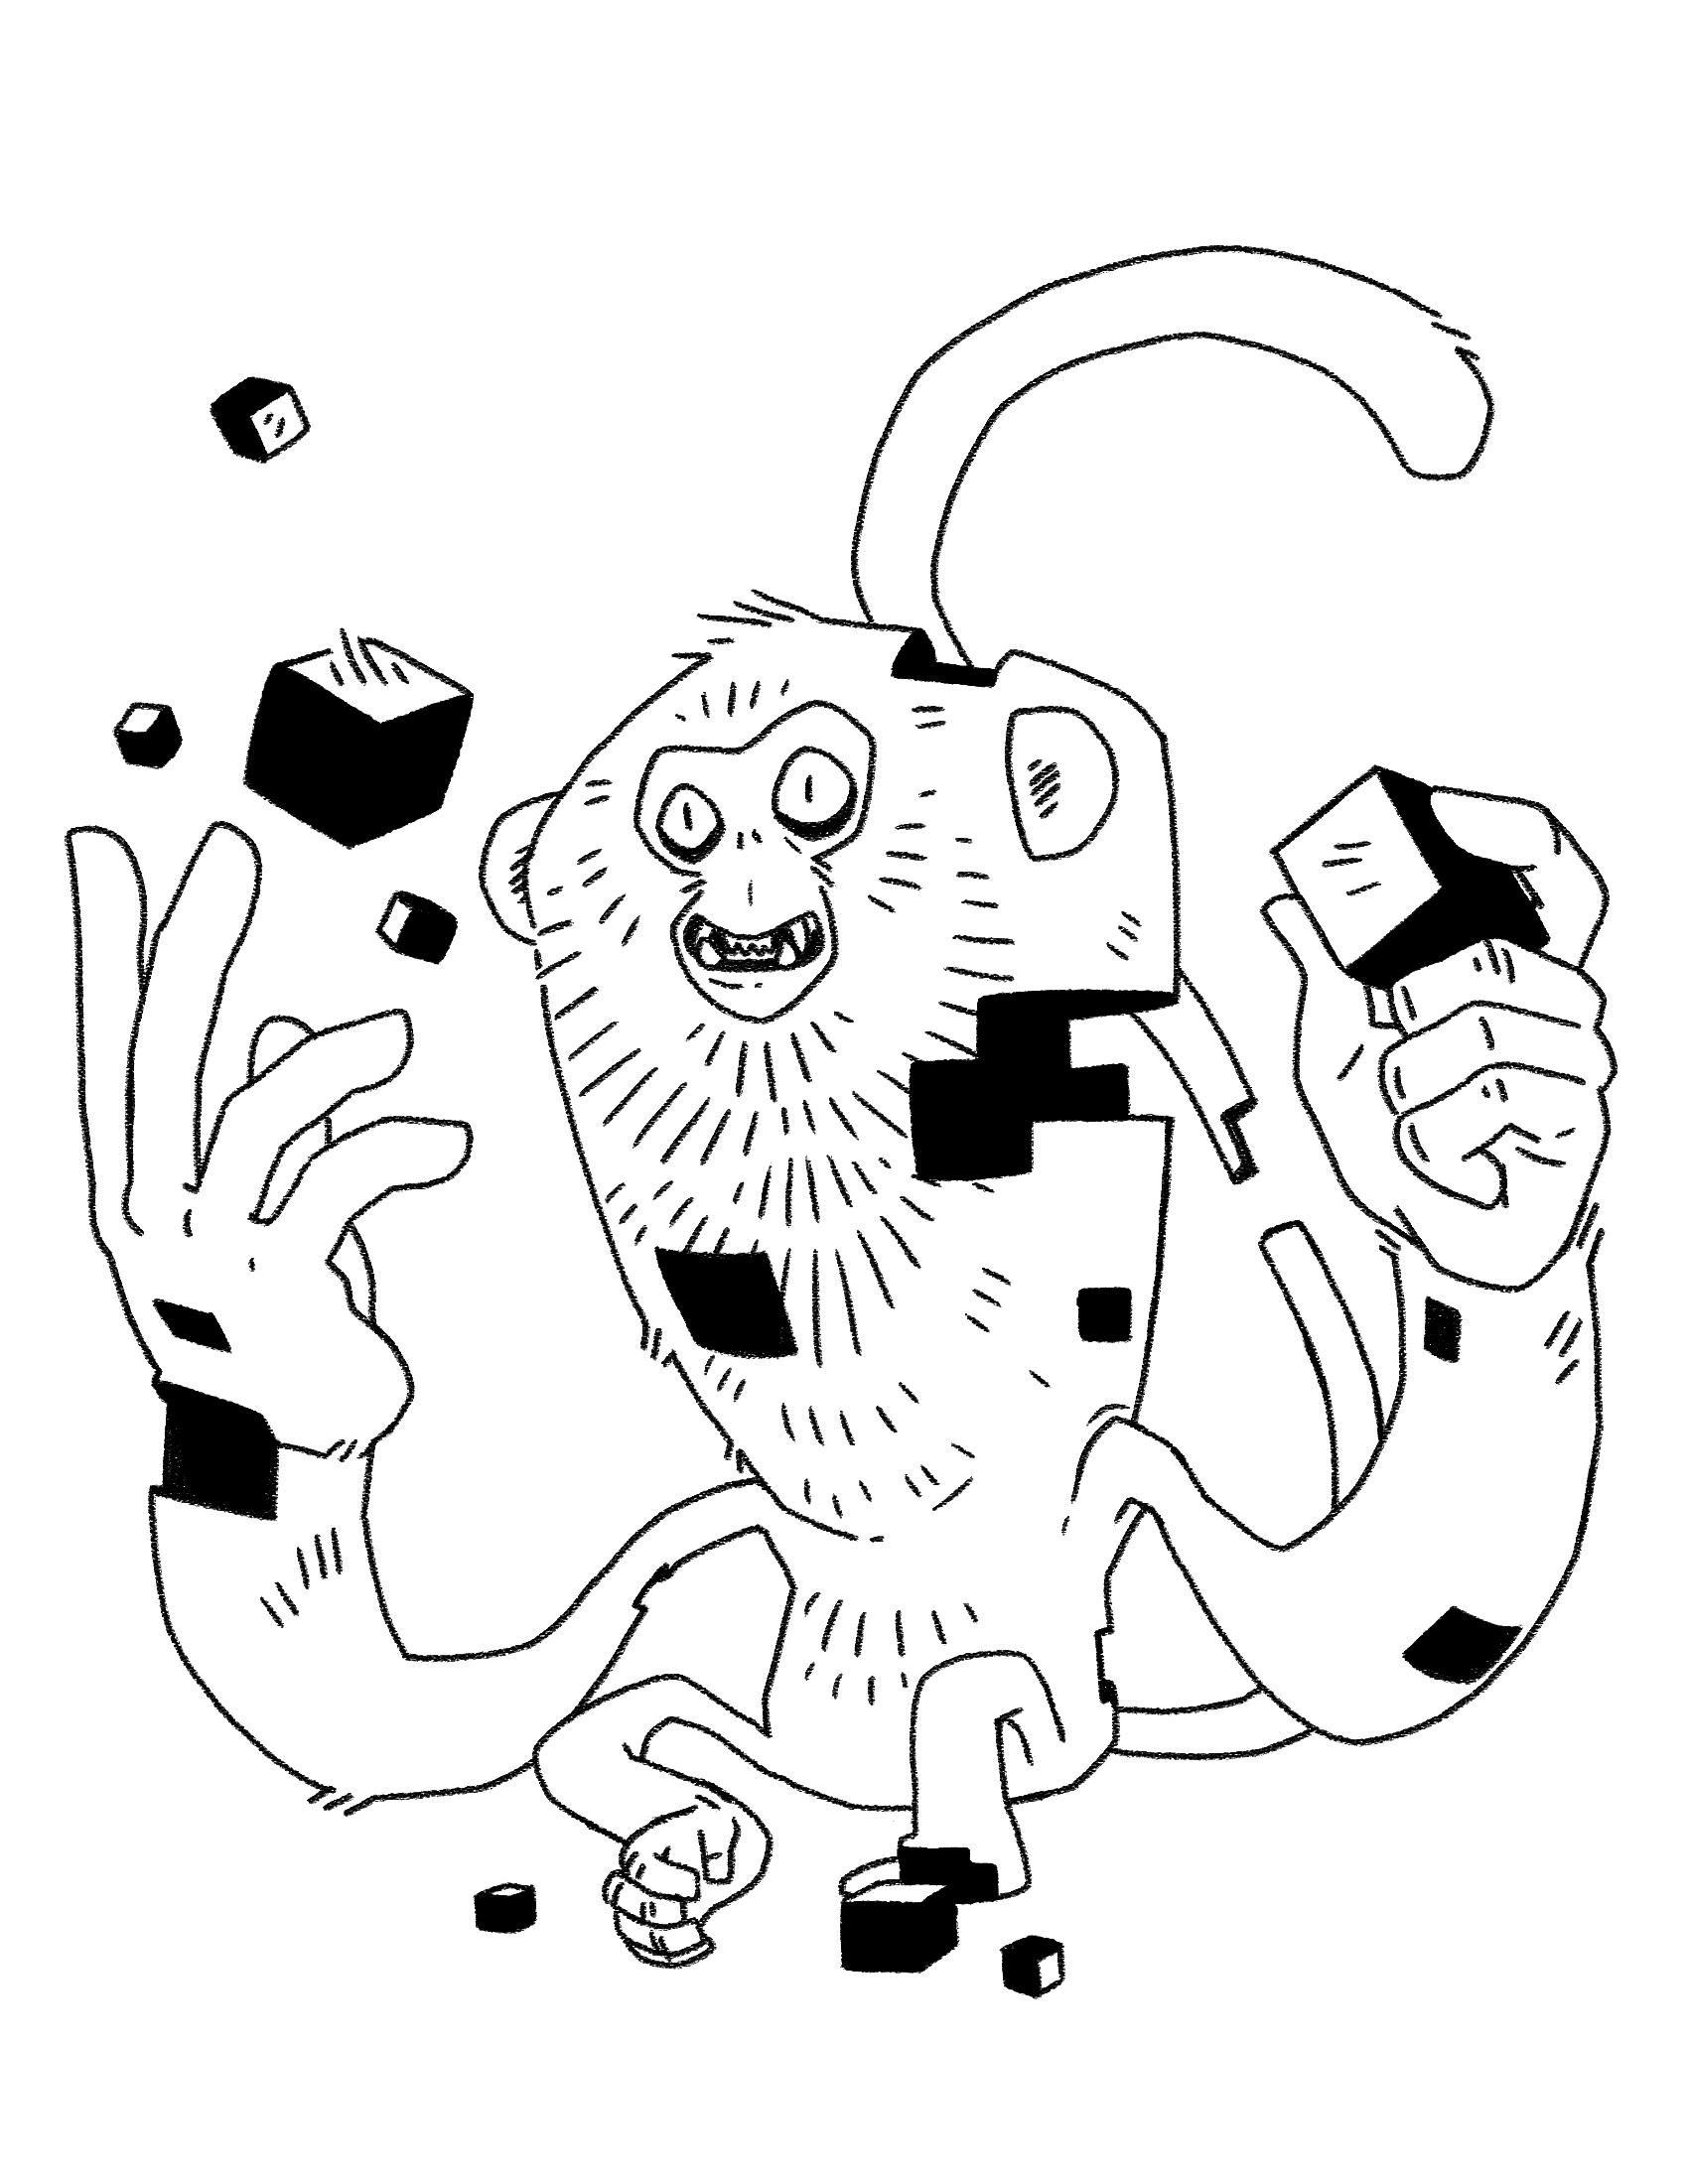 zodiac_0019_monkey.jpg